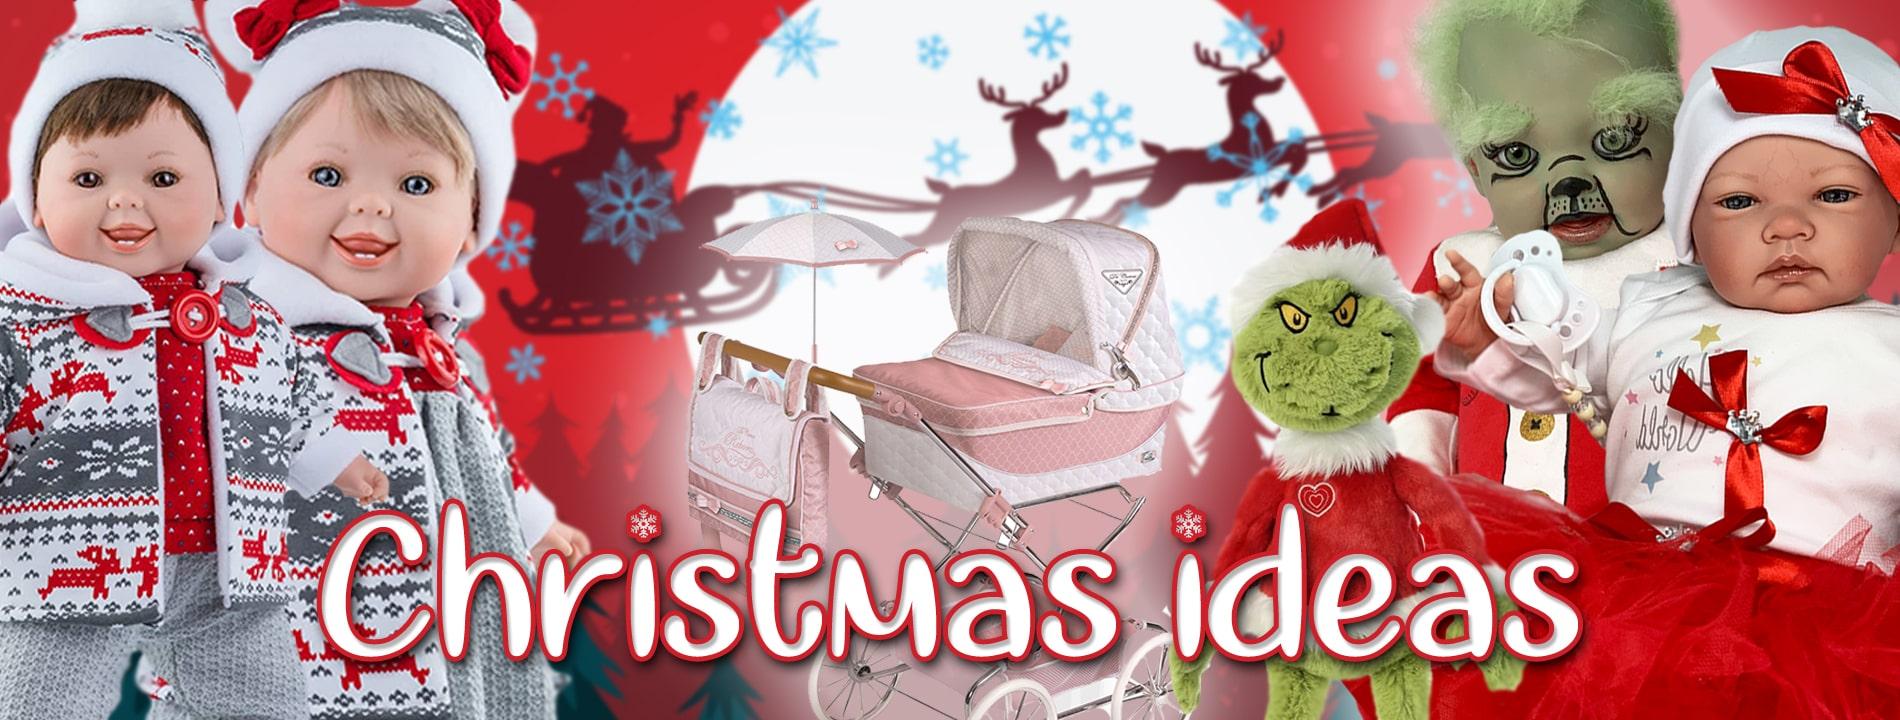 Christmas Ideas Banner